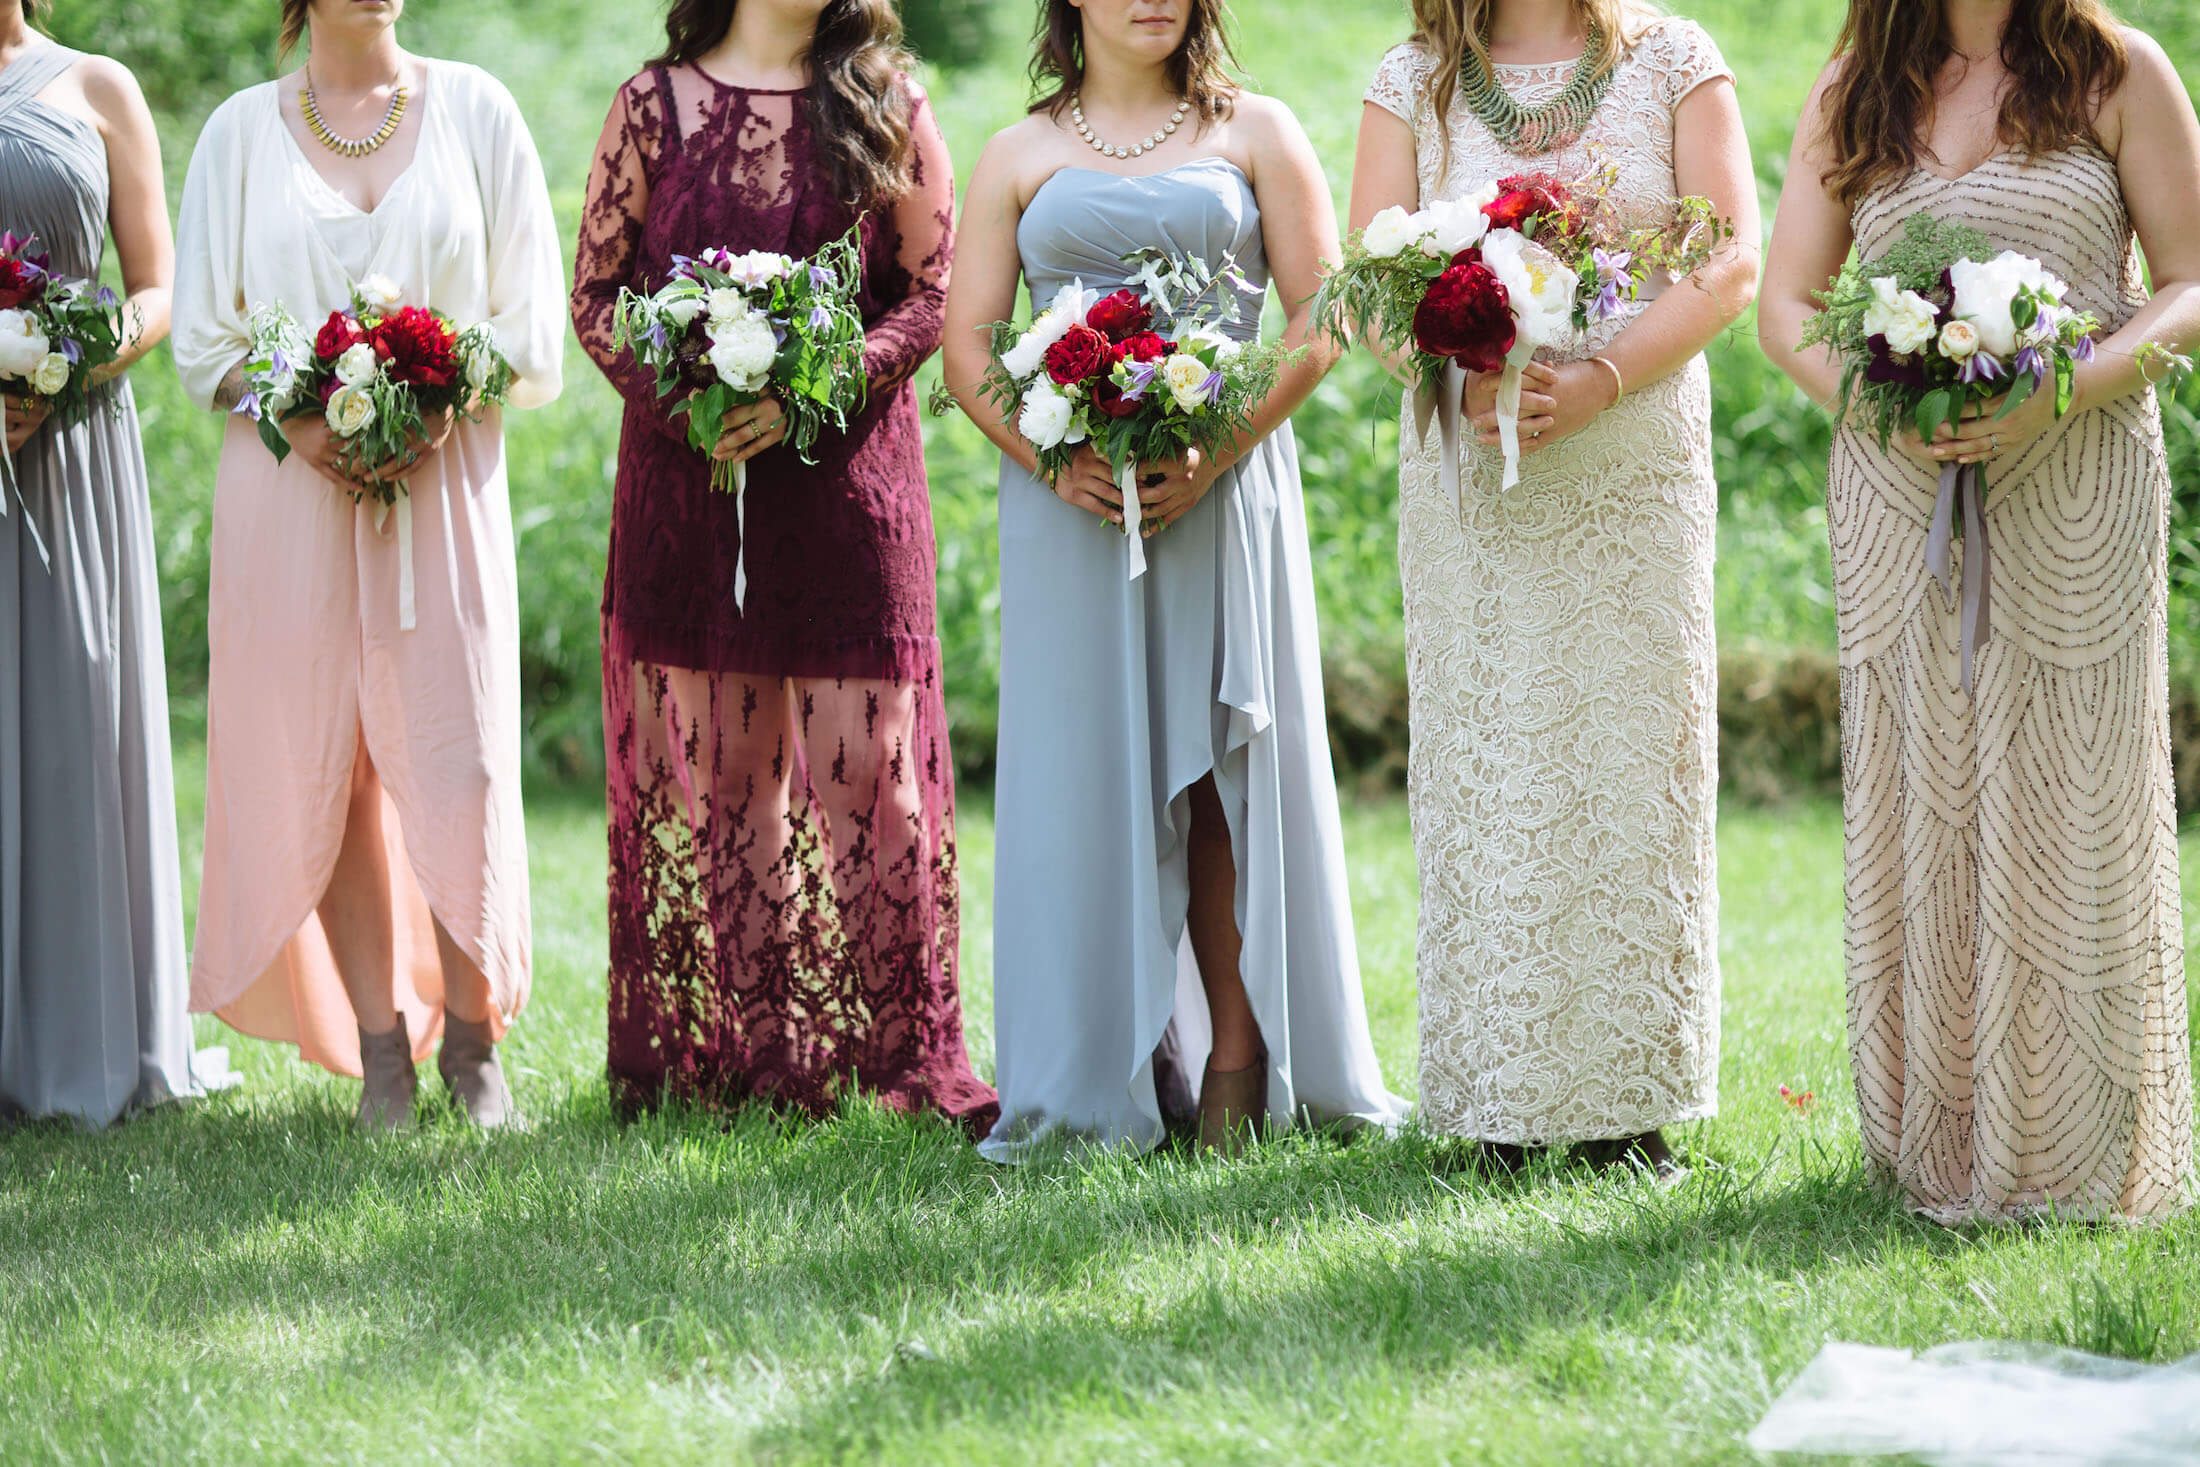 engle-olson-ray-kelly-photography-wisconsin-wedding-69.jpg